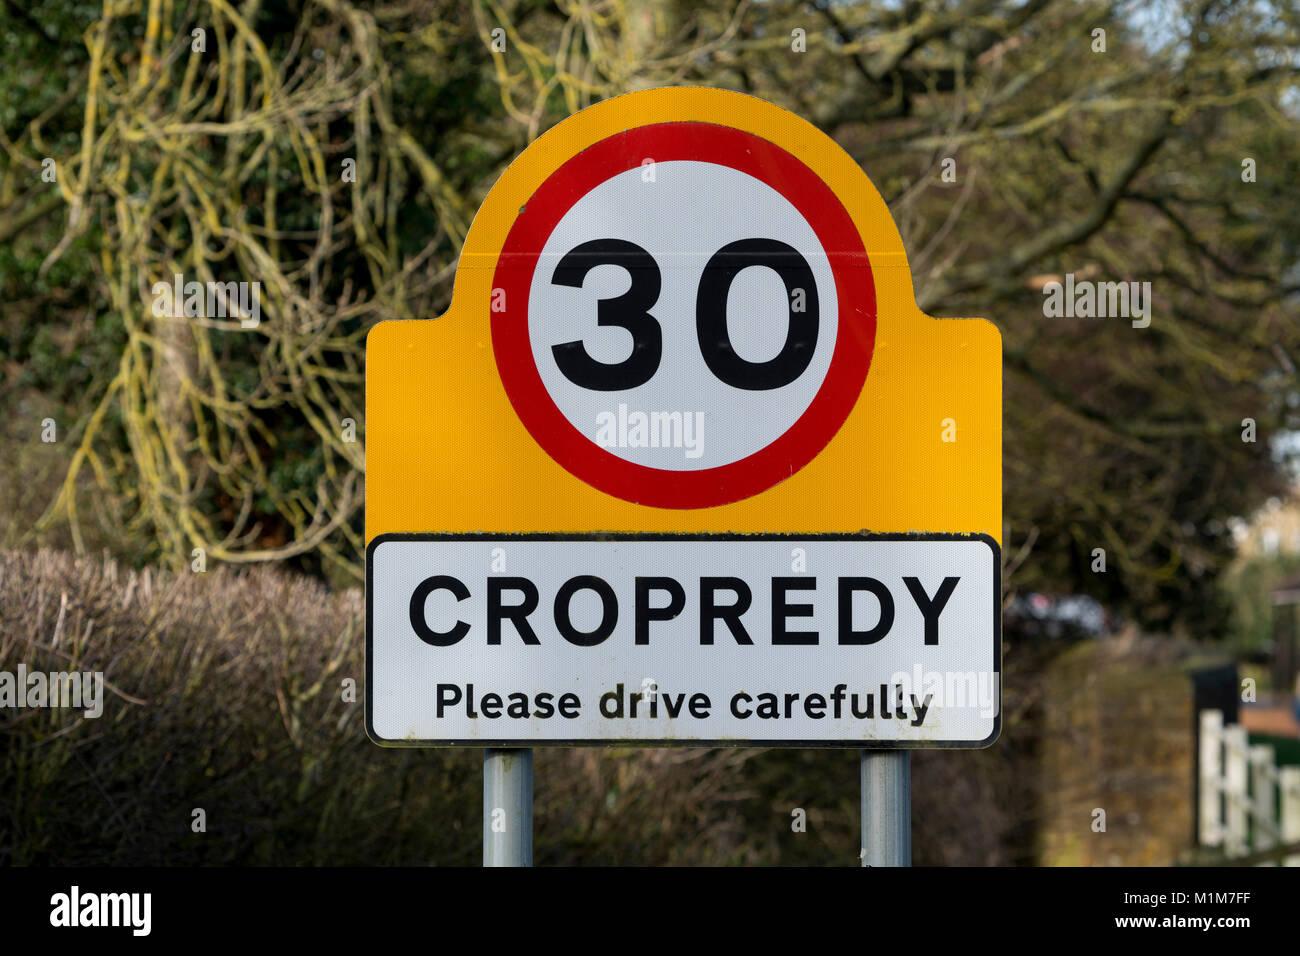 Cropredy village sign, Oxfordshire, England, UK - Stock Image